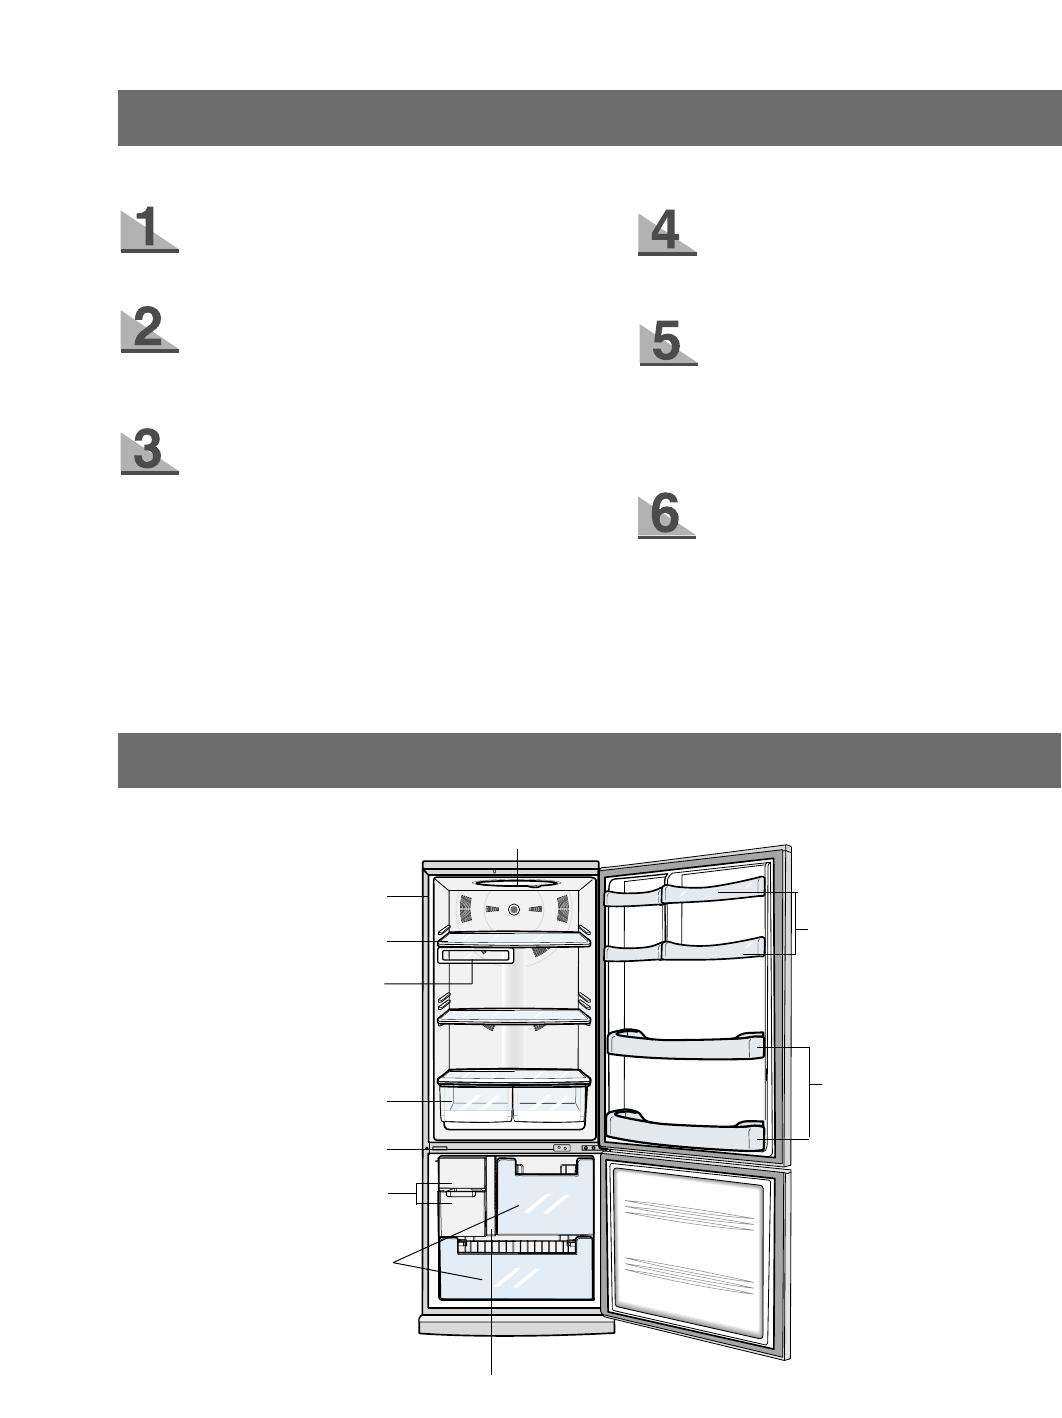 samsung rb215labp, rb215lash prep aring the fridge / freezer, view of your  fridge / freezer